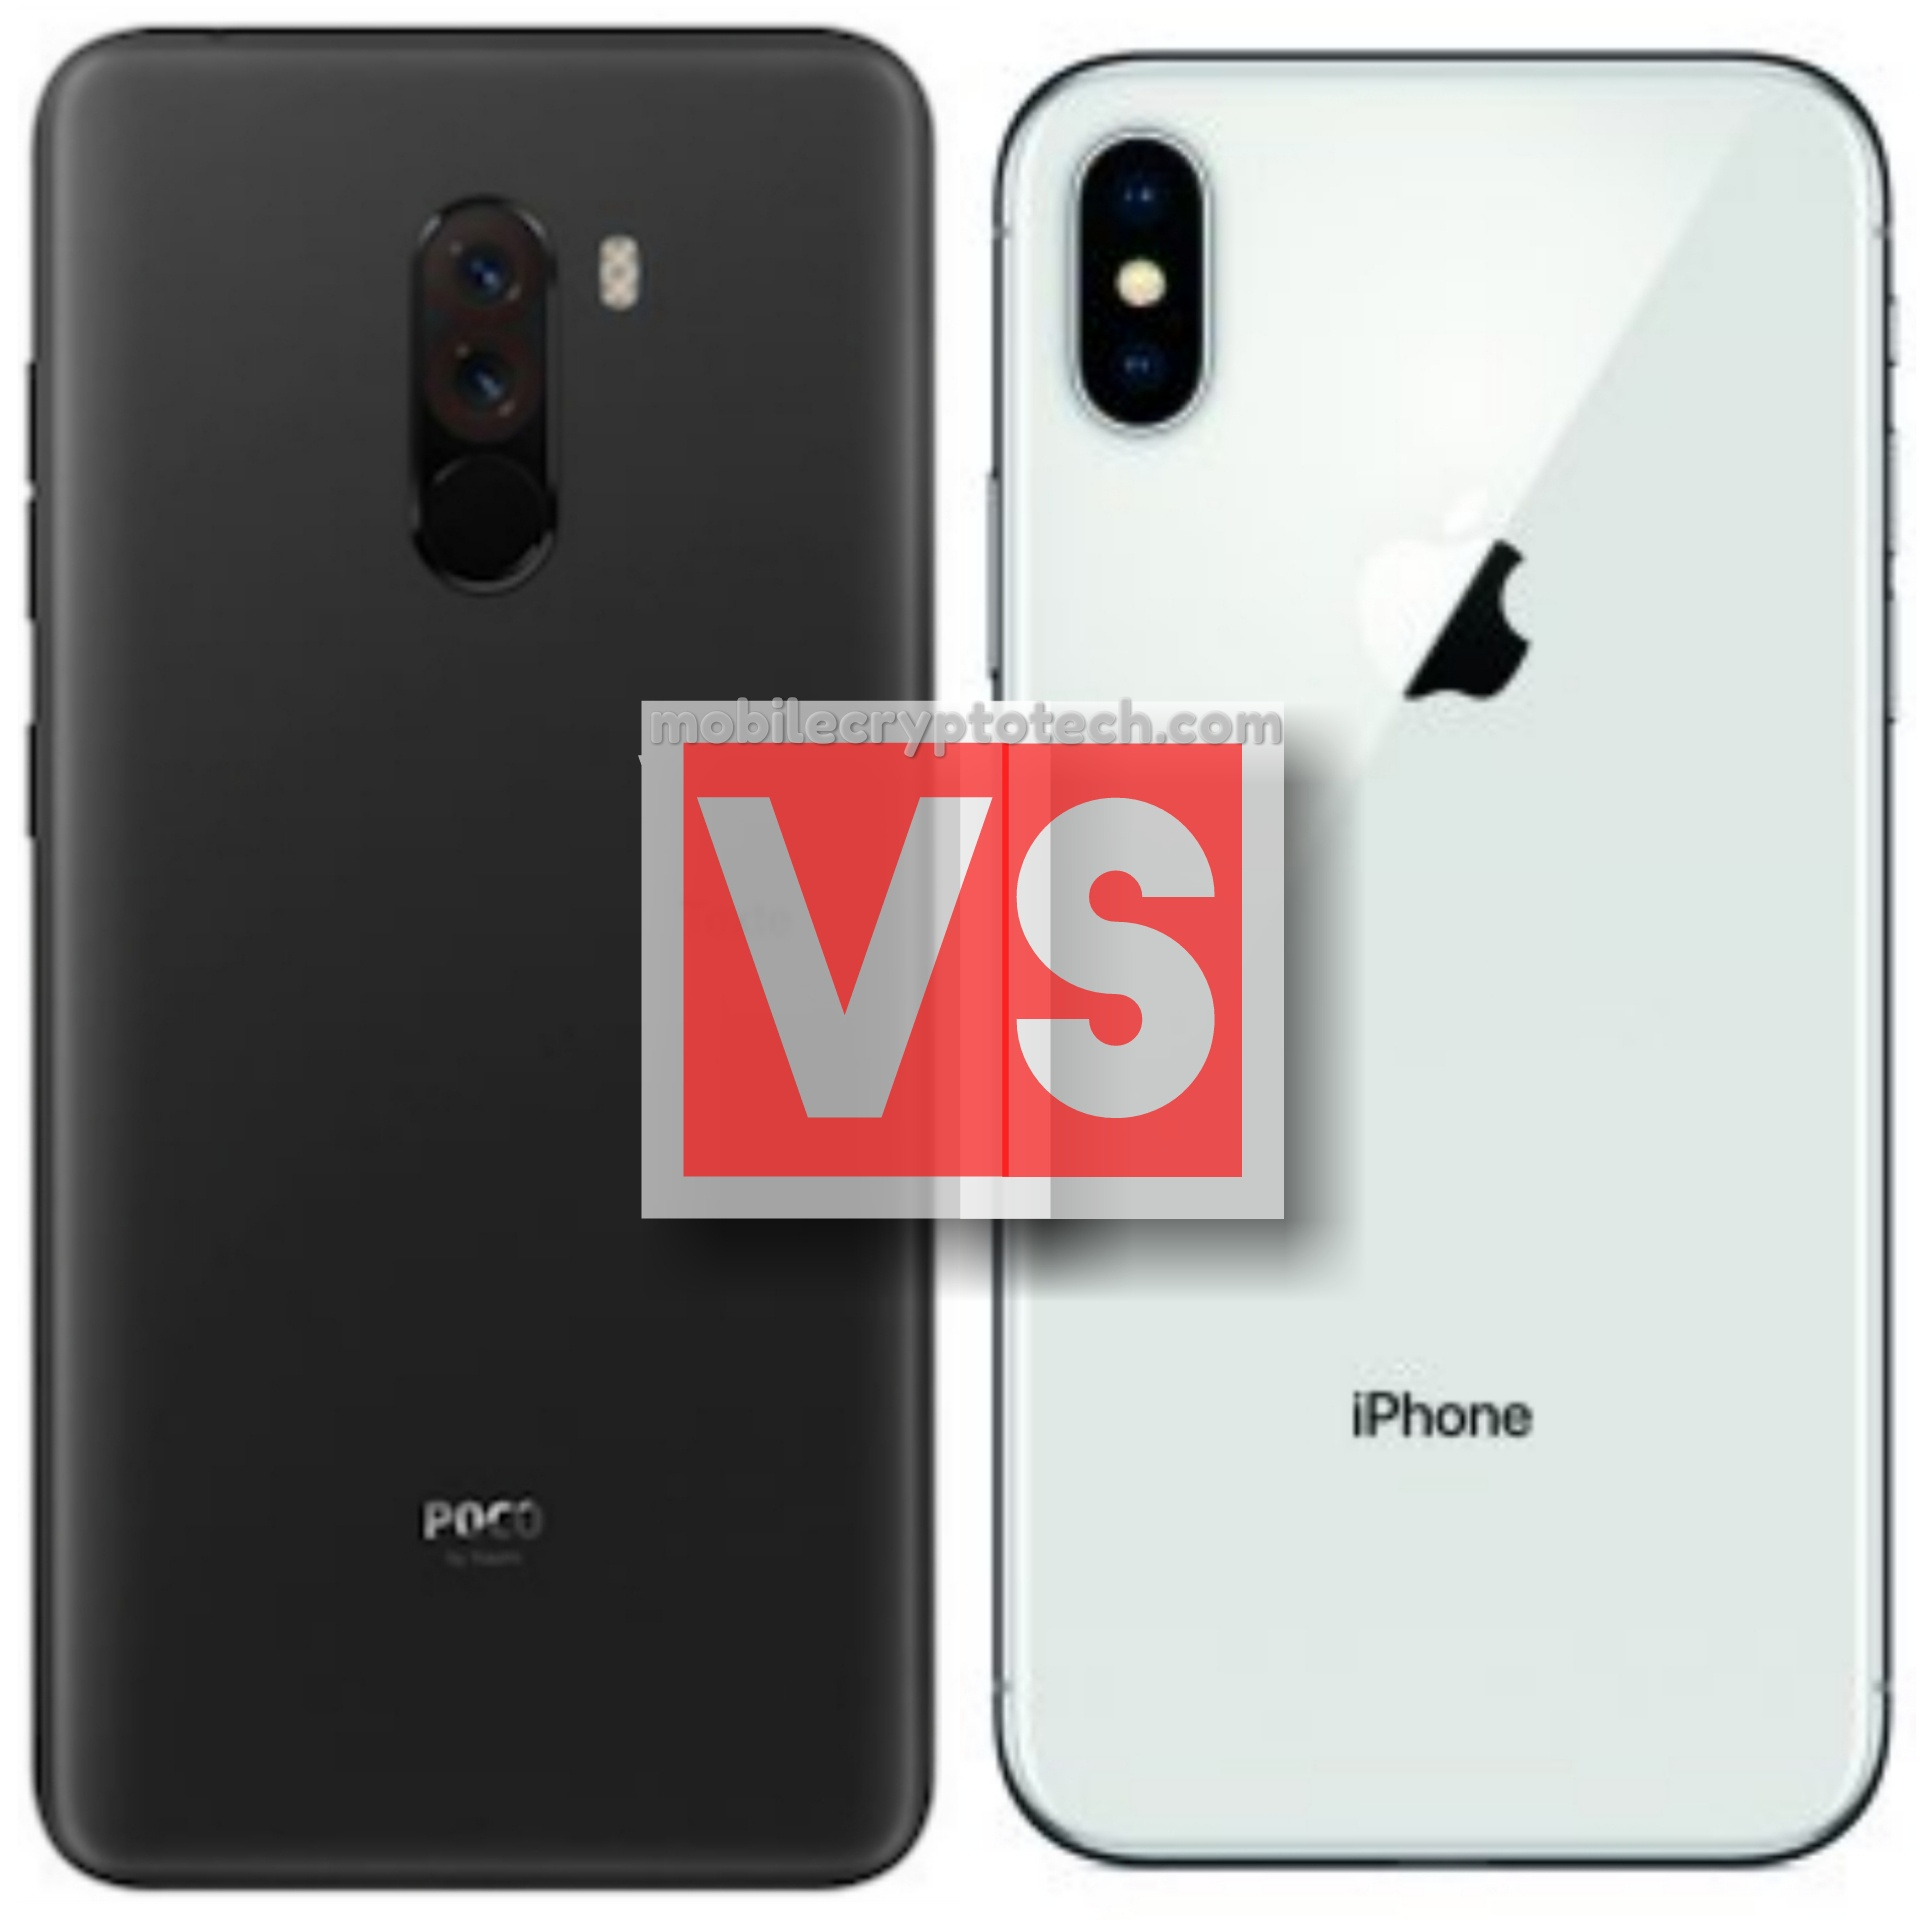 Xiaomi PocoPhone F1 Vs Apple iPhone X